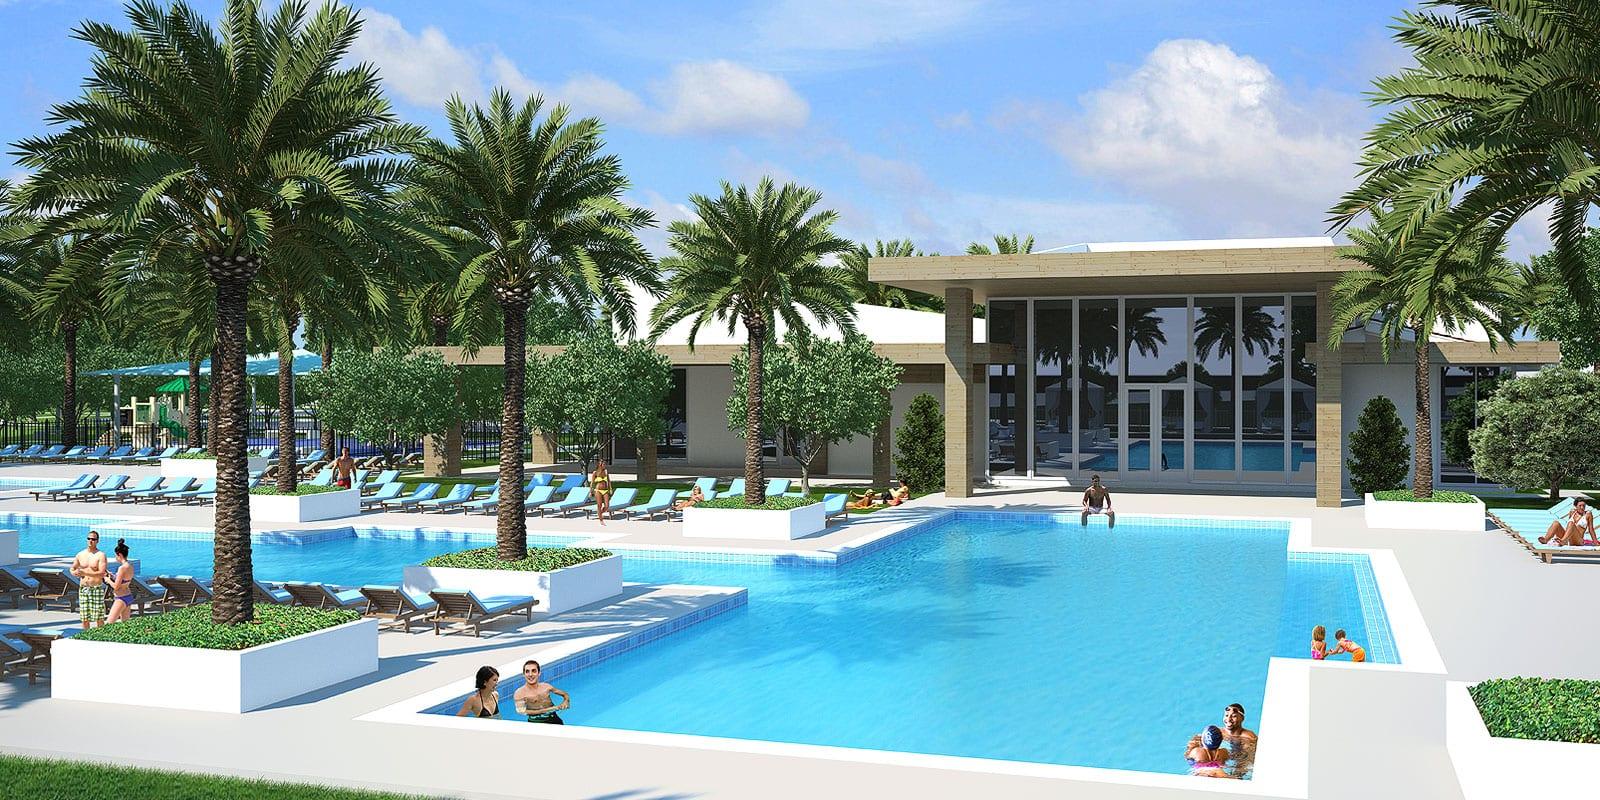 Alton Palm Beach Gardens Product Shots